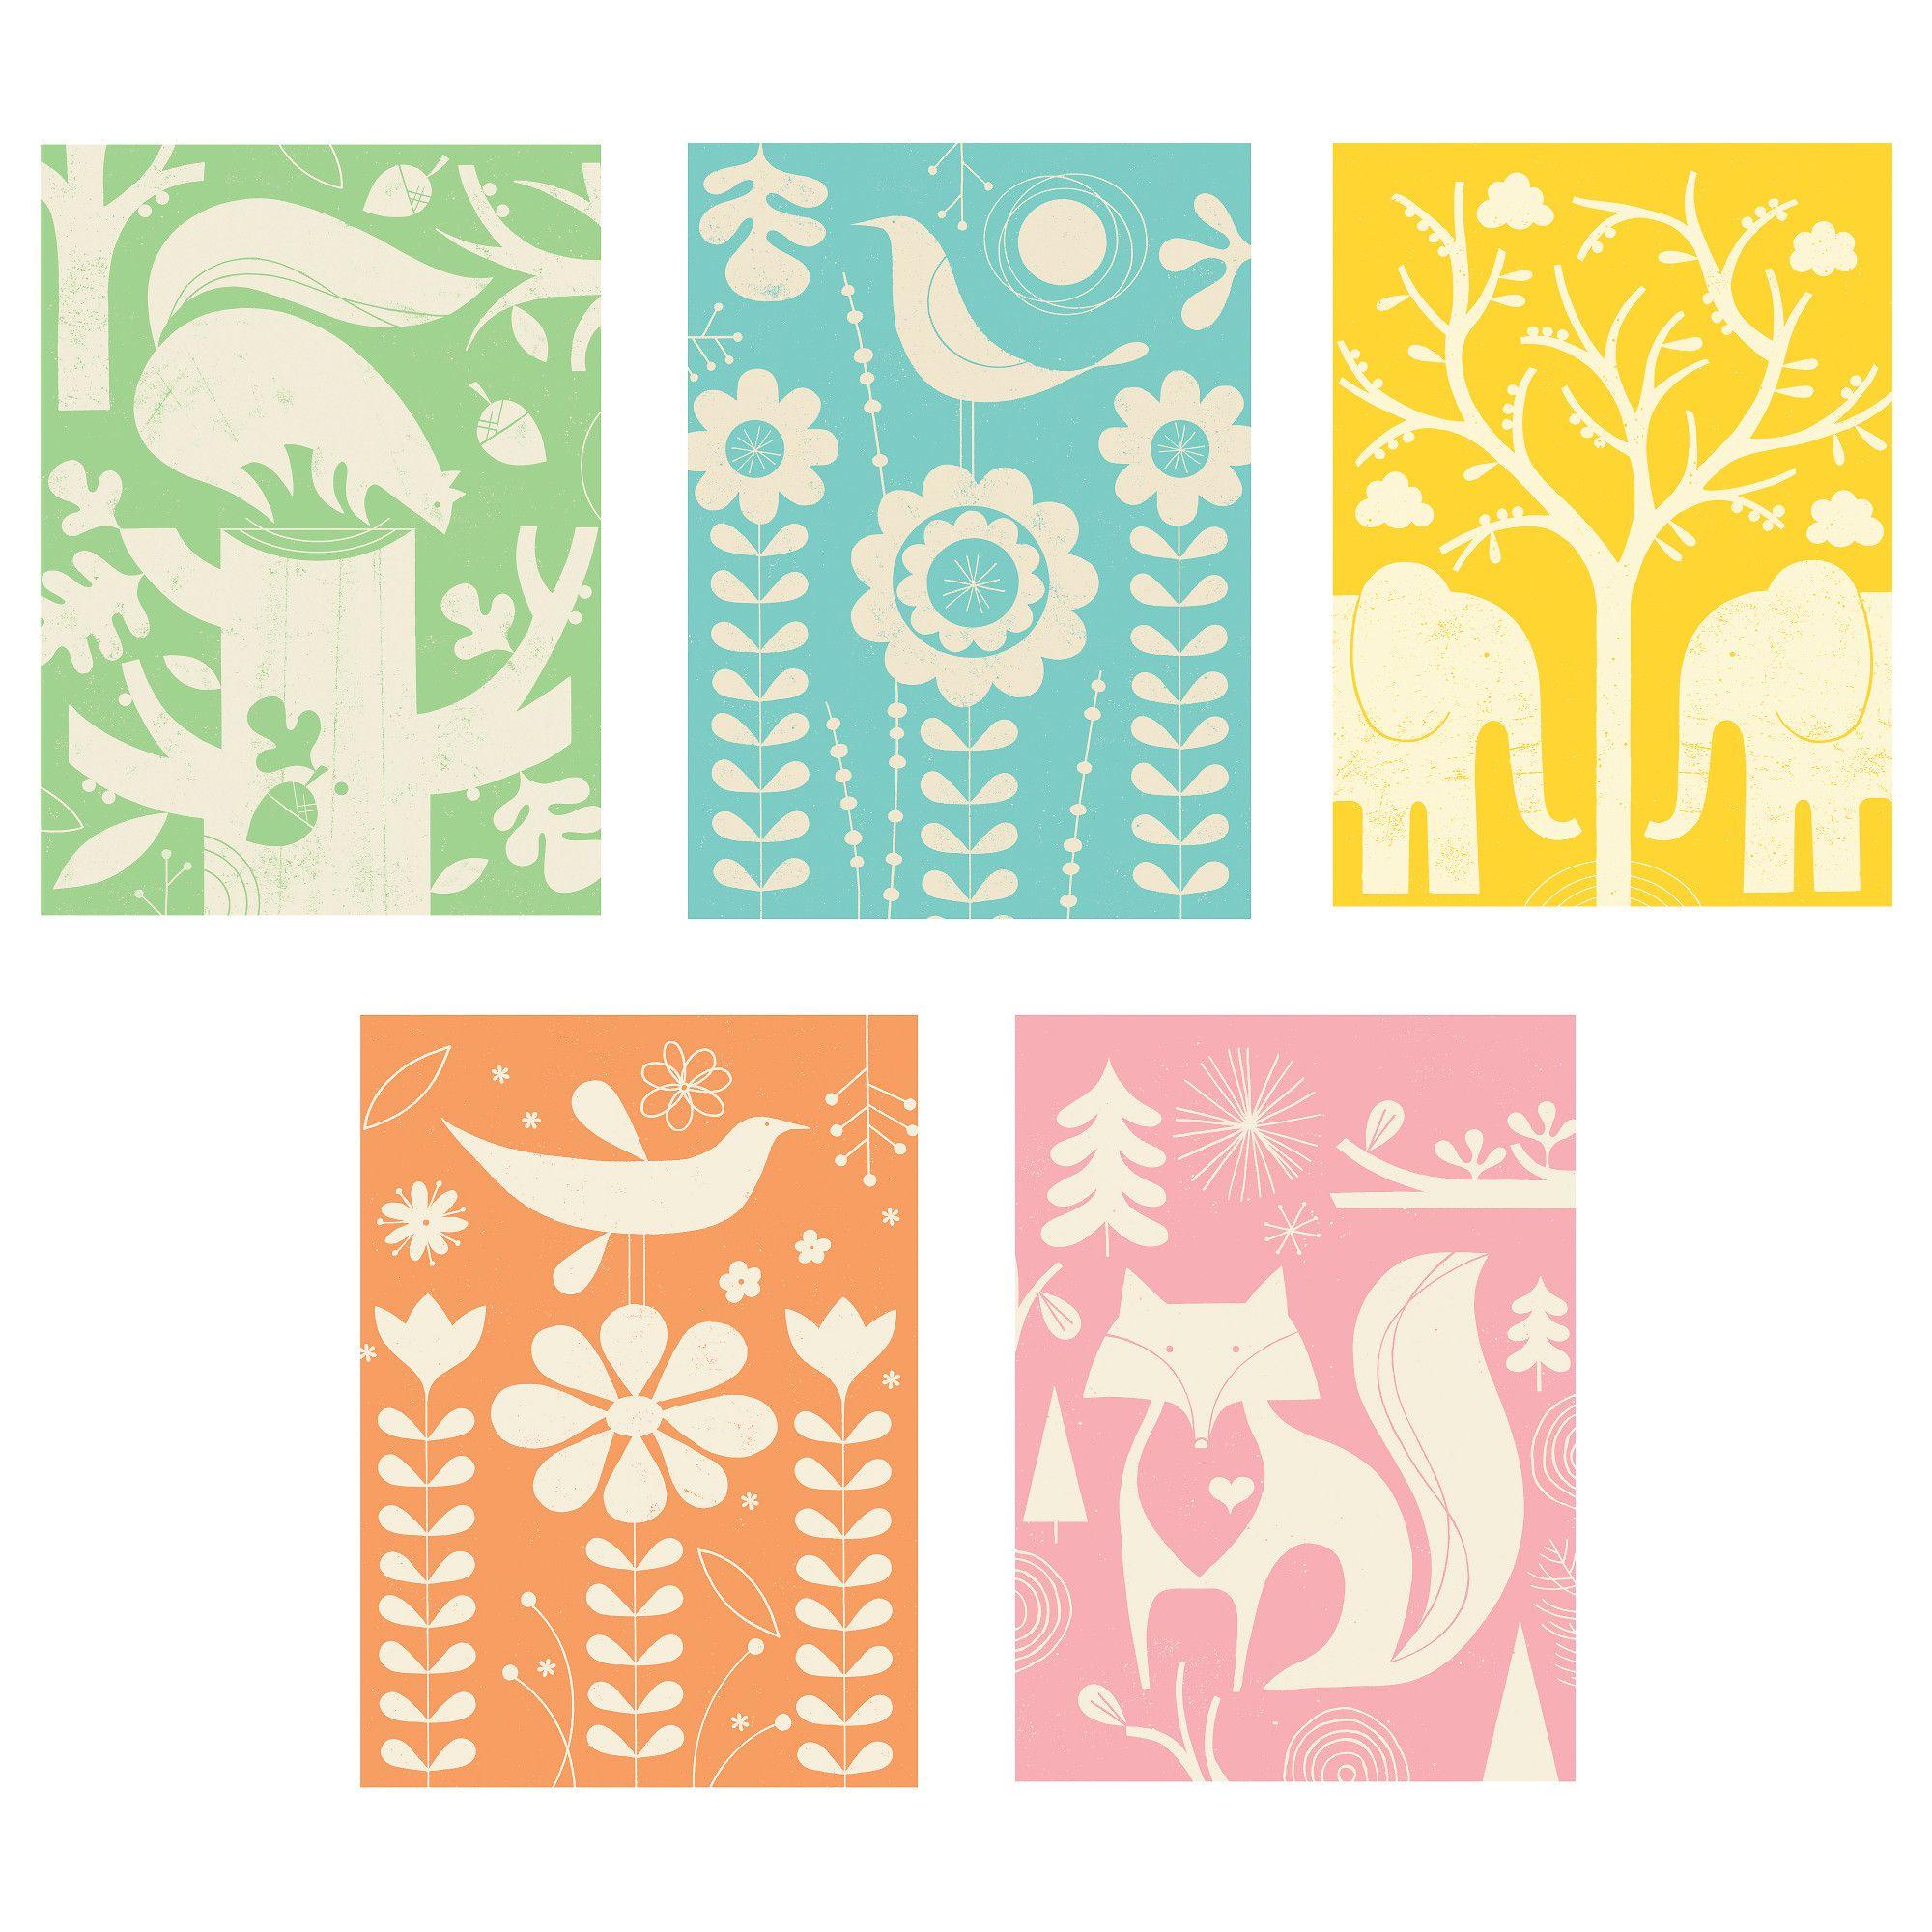 KORT Art card - IKEA   Art I Like 5   Pinterest   Ikea art, Ikea ...